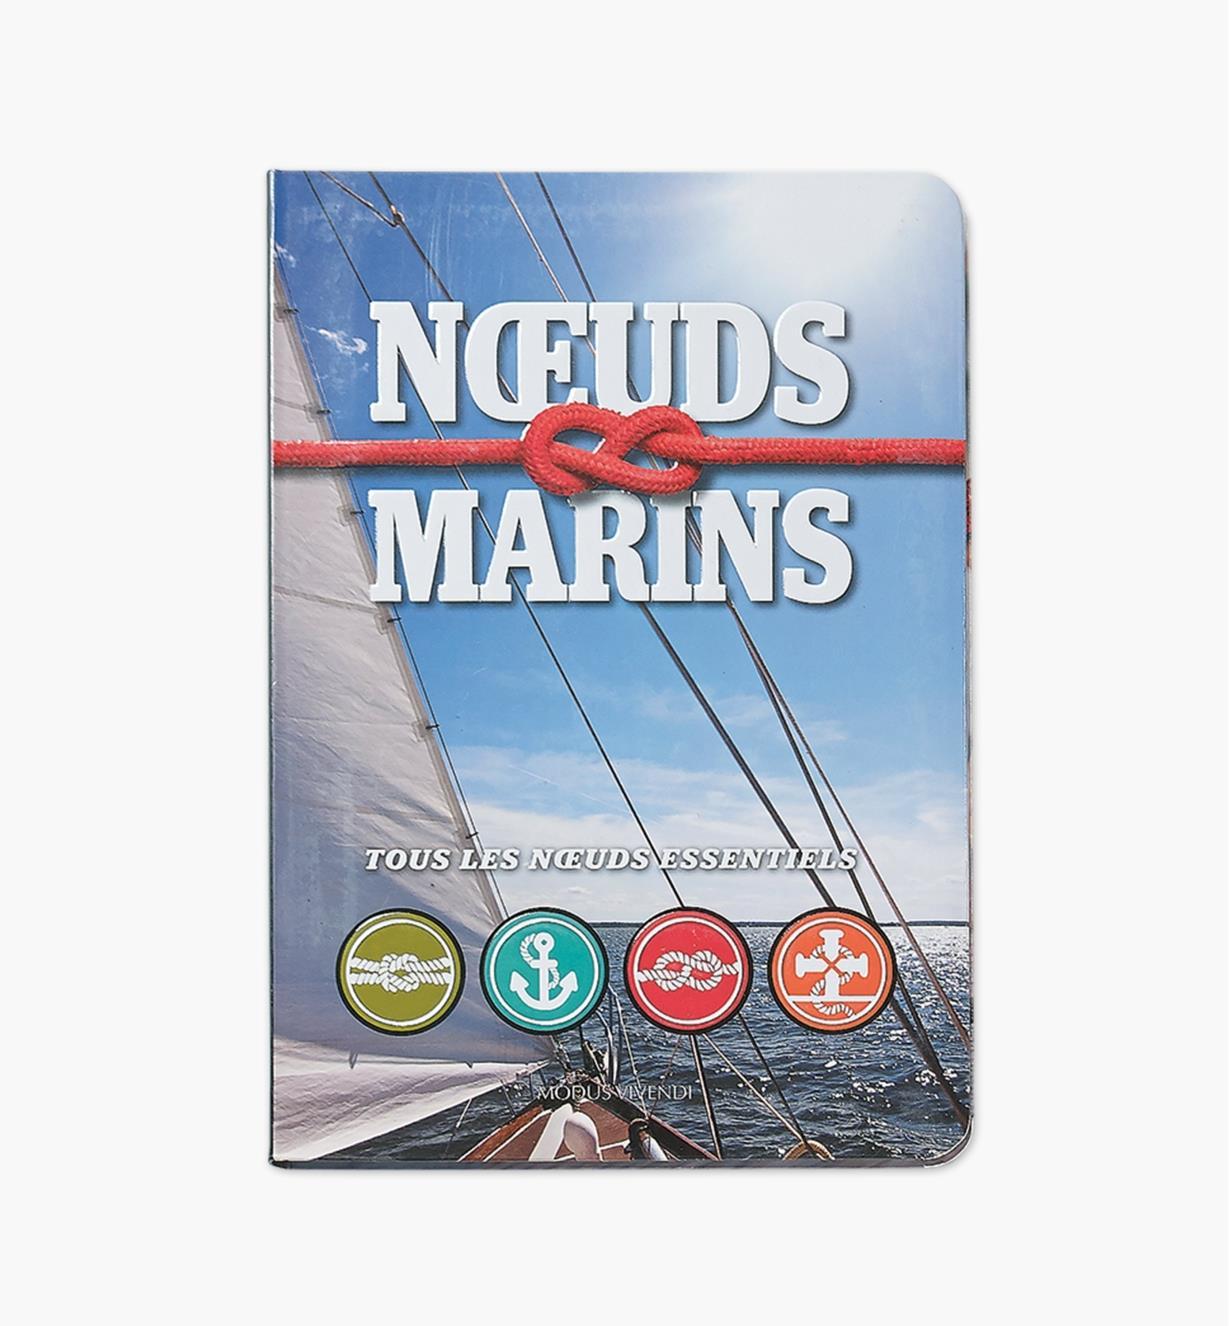 LD810 - Noeuds Marins-Tous les Noeuds Essentiels